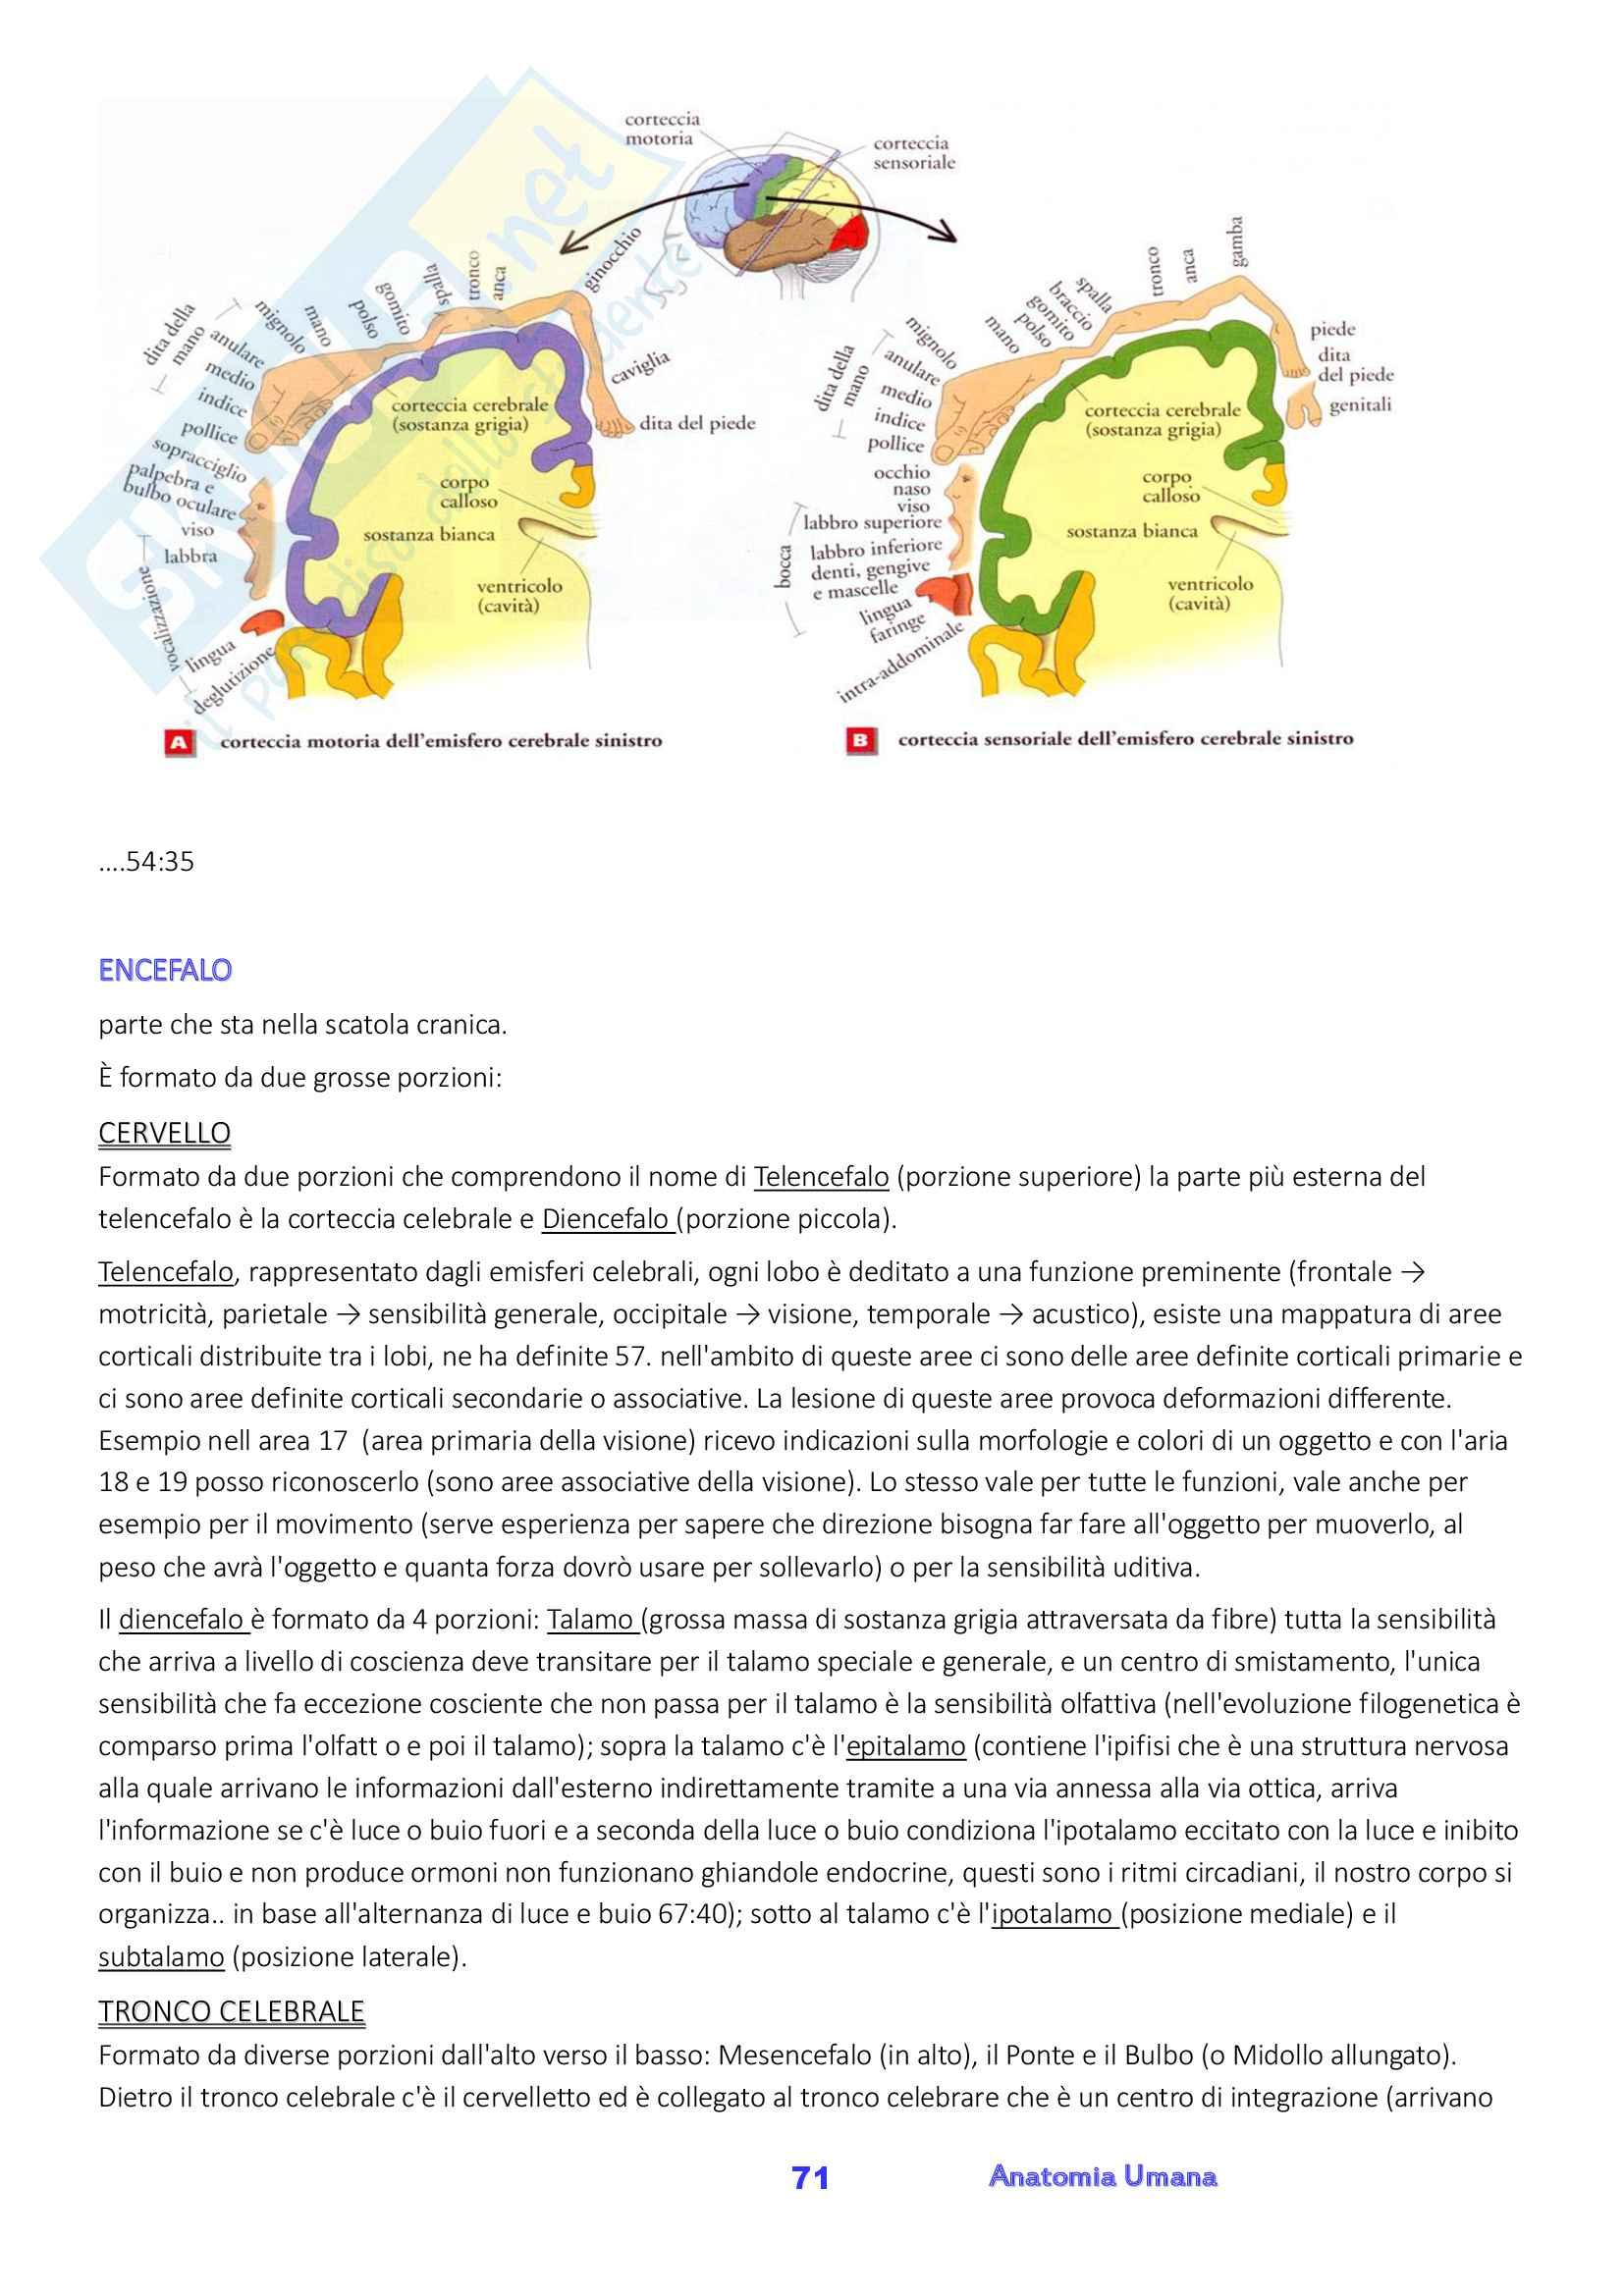 Anatomia umana, Appunti, Prof.ssa Ferretti Pag. 71